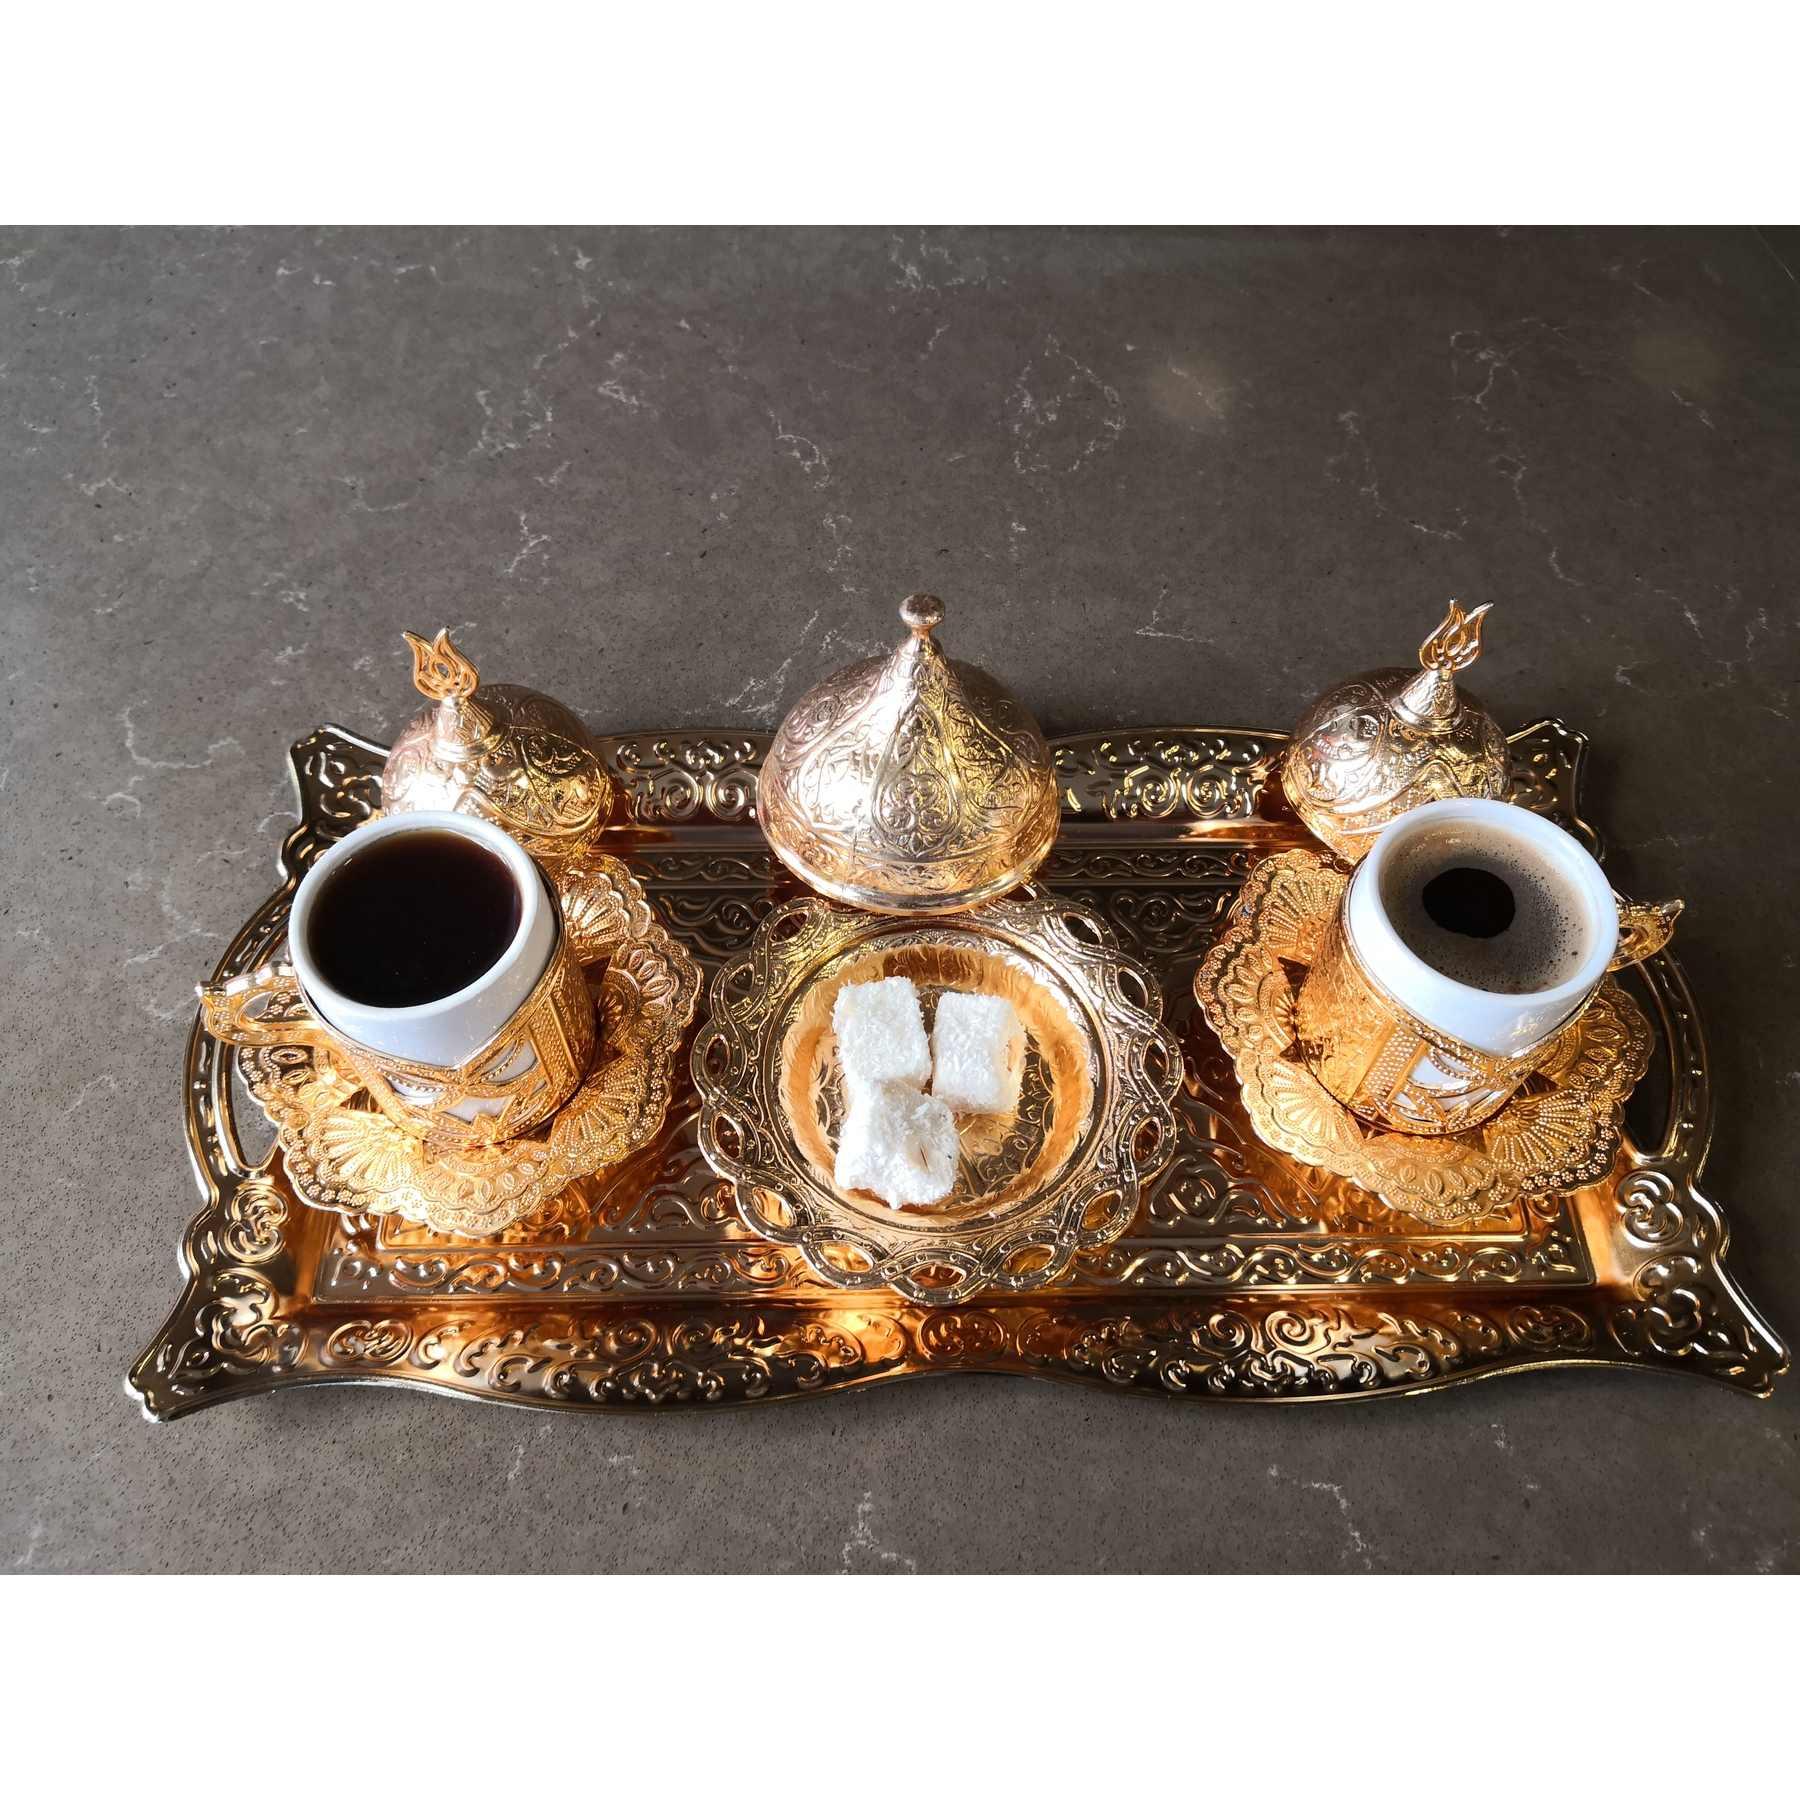 (9 PZ) Rame turco tè caffè espresso tazze set Anatolica Arabo tazze di caffè set Ottoman Tea Set MADE in Turchia